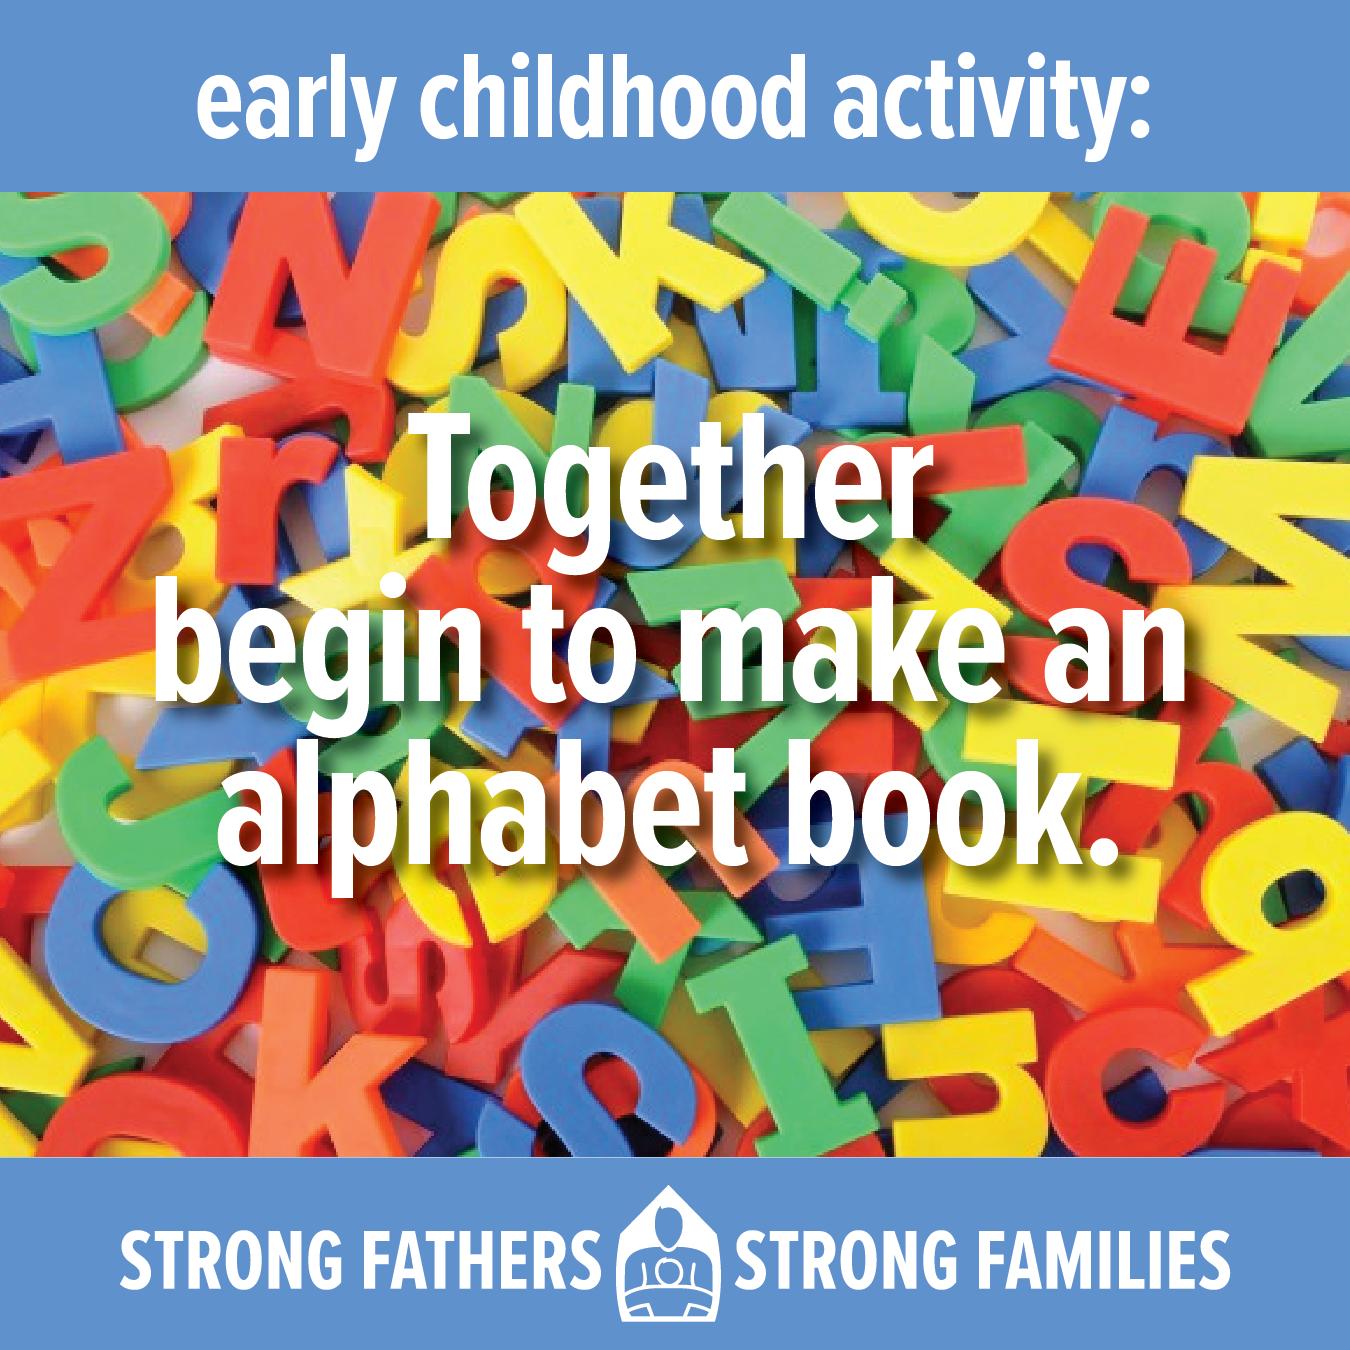 Together begin to make an alphabet book.